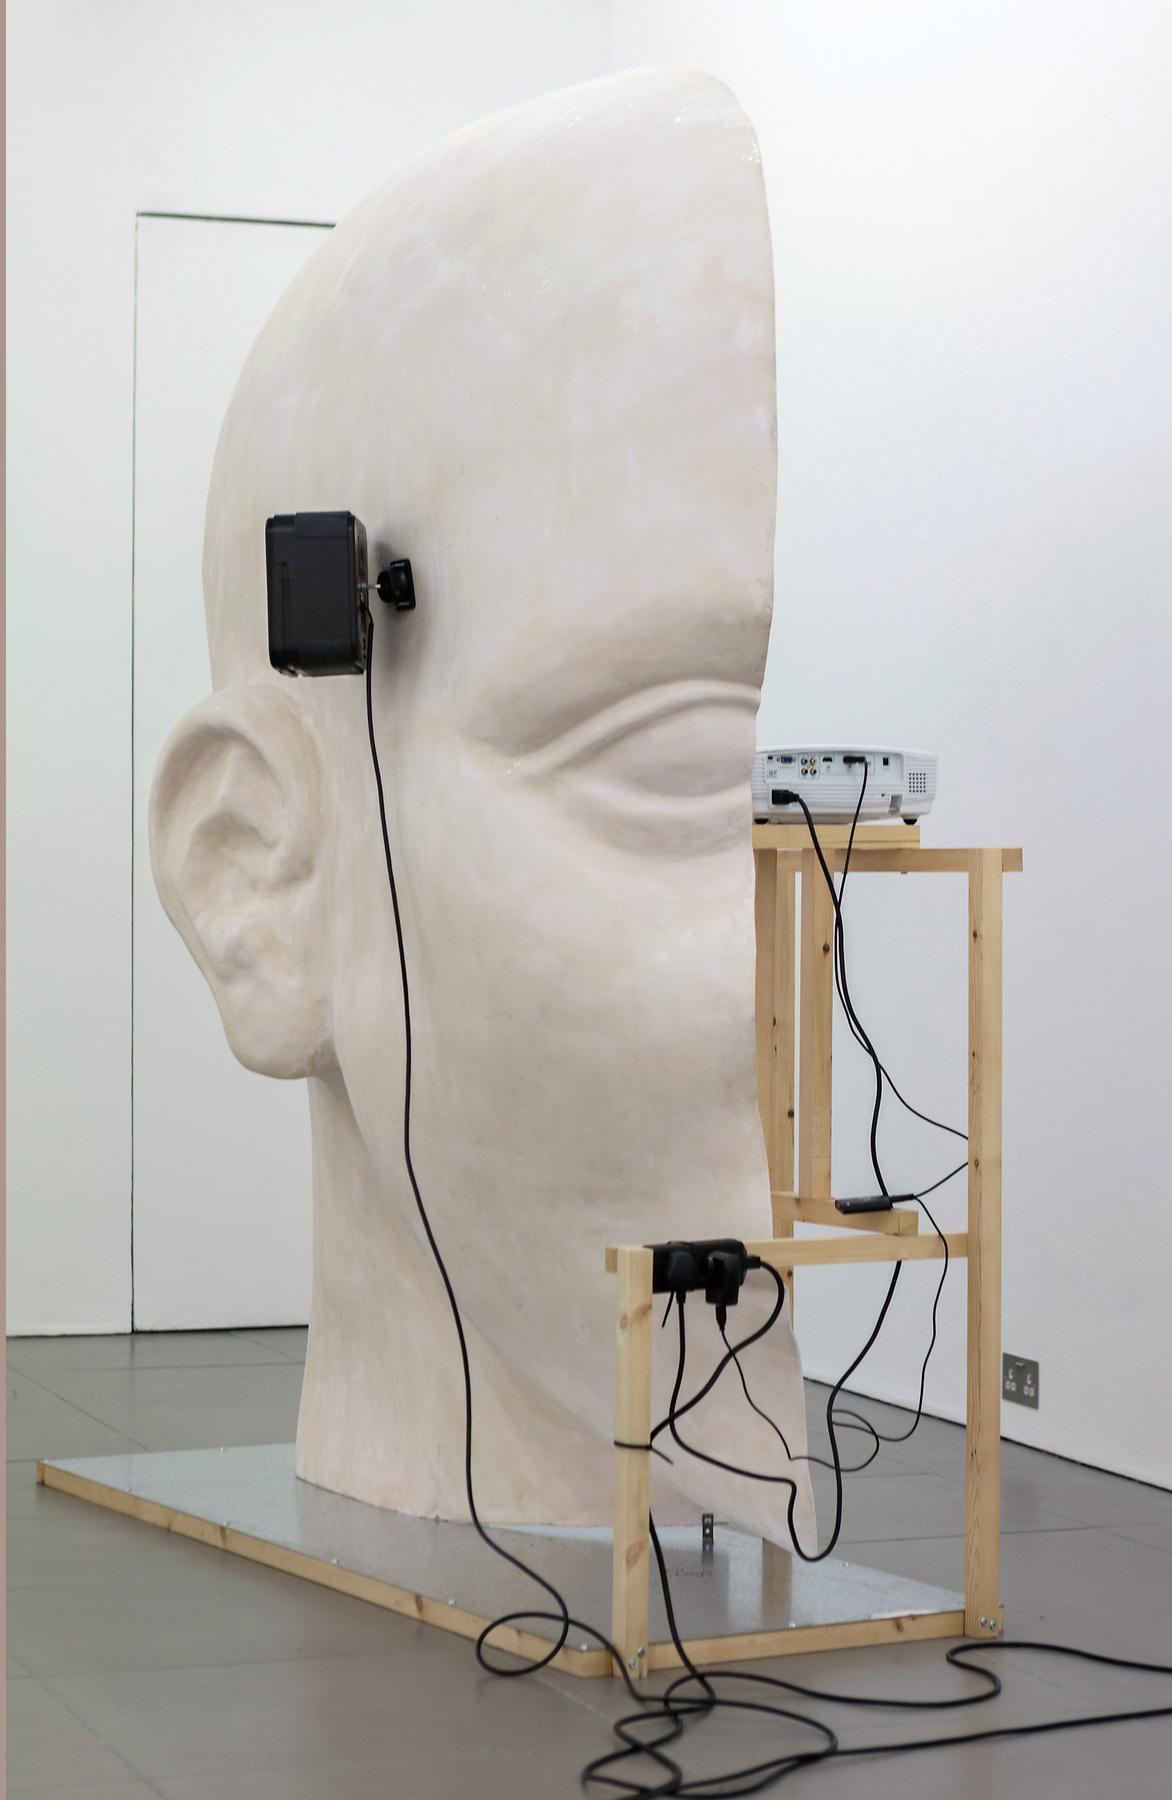 04. Anne de Vries, SUBMISSION 2015, wood, metal, fibreglass resin, audio, video